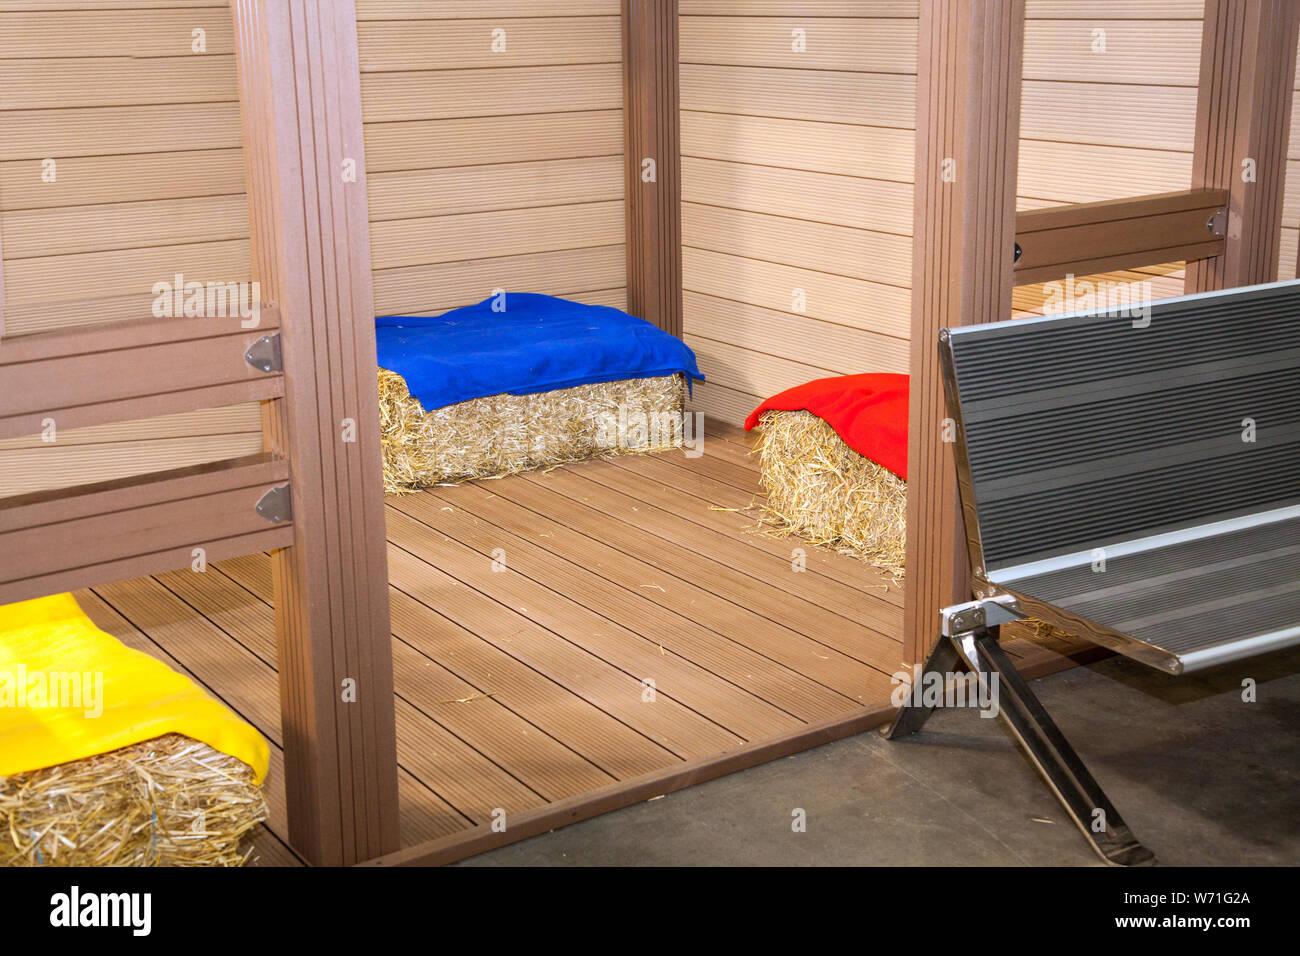 bales of hay on floor near wooden walls Stock Photo